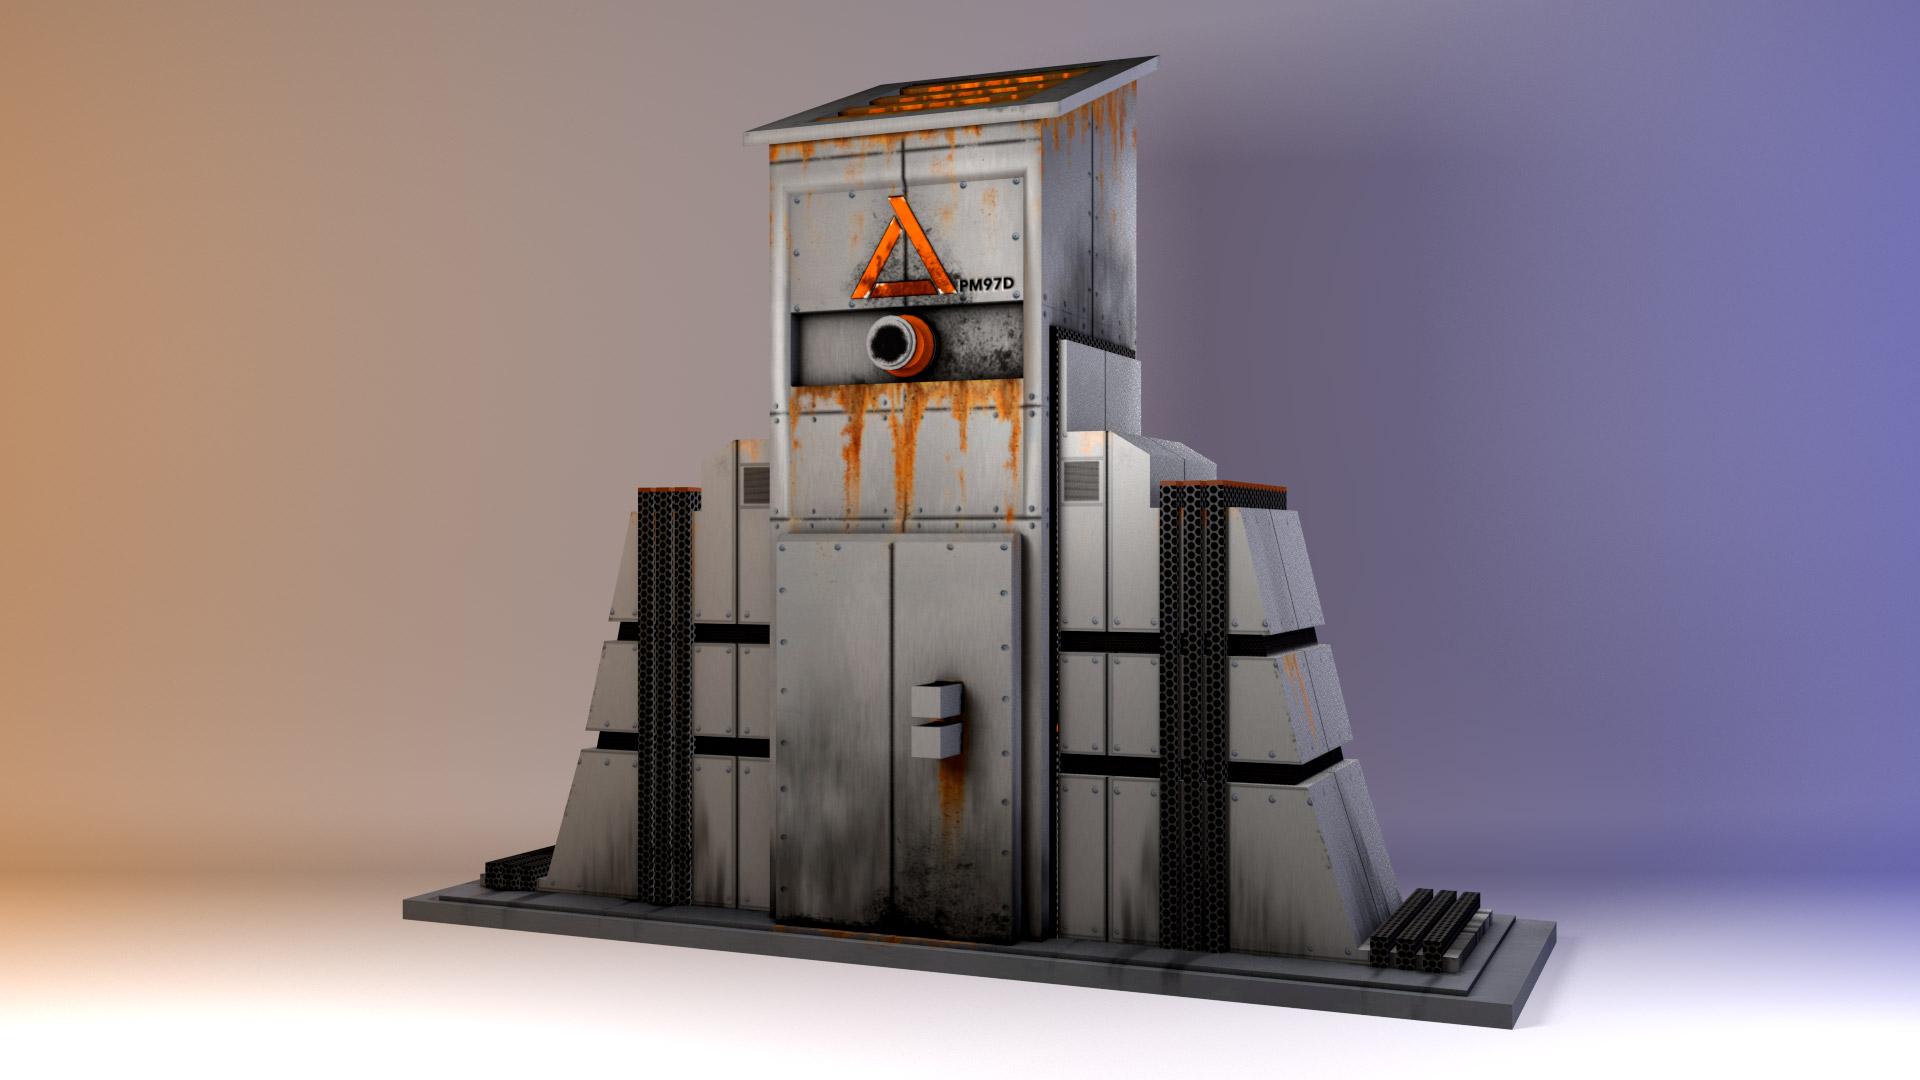 Pillar Prop modeled in Maya. Rendered in Mental Ray.